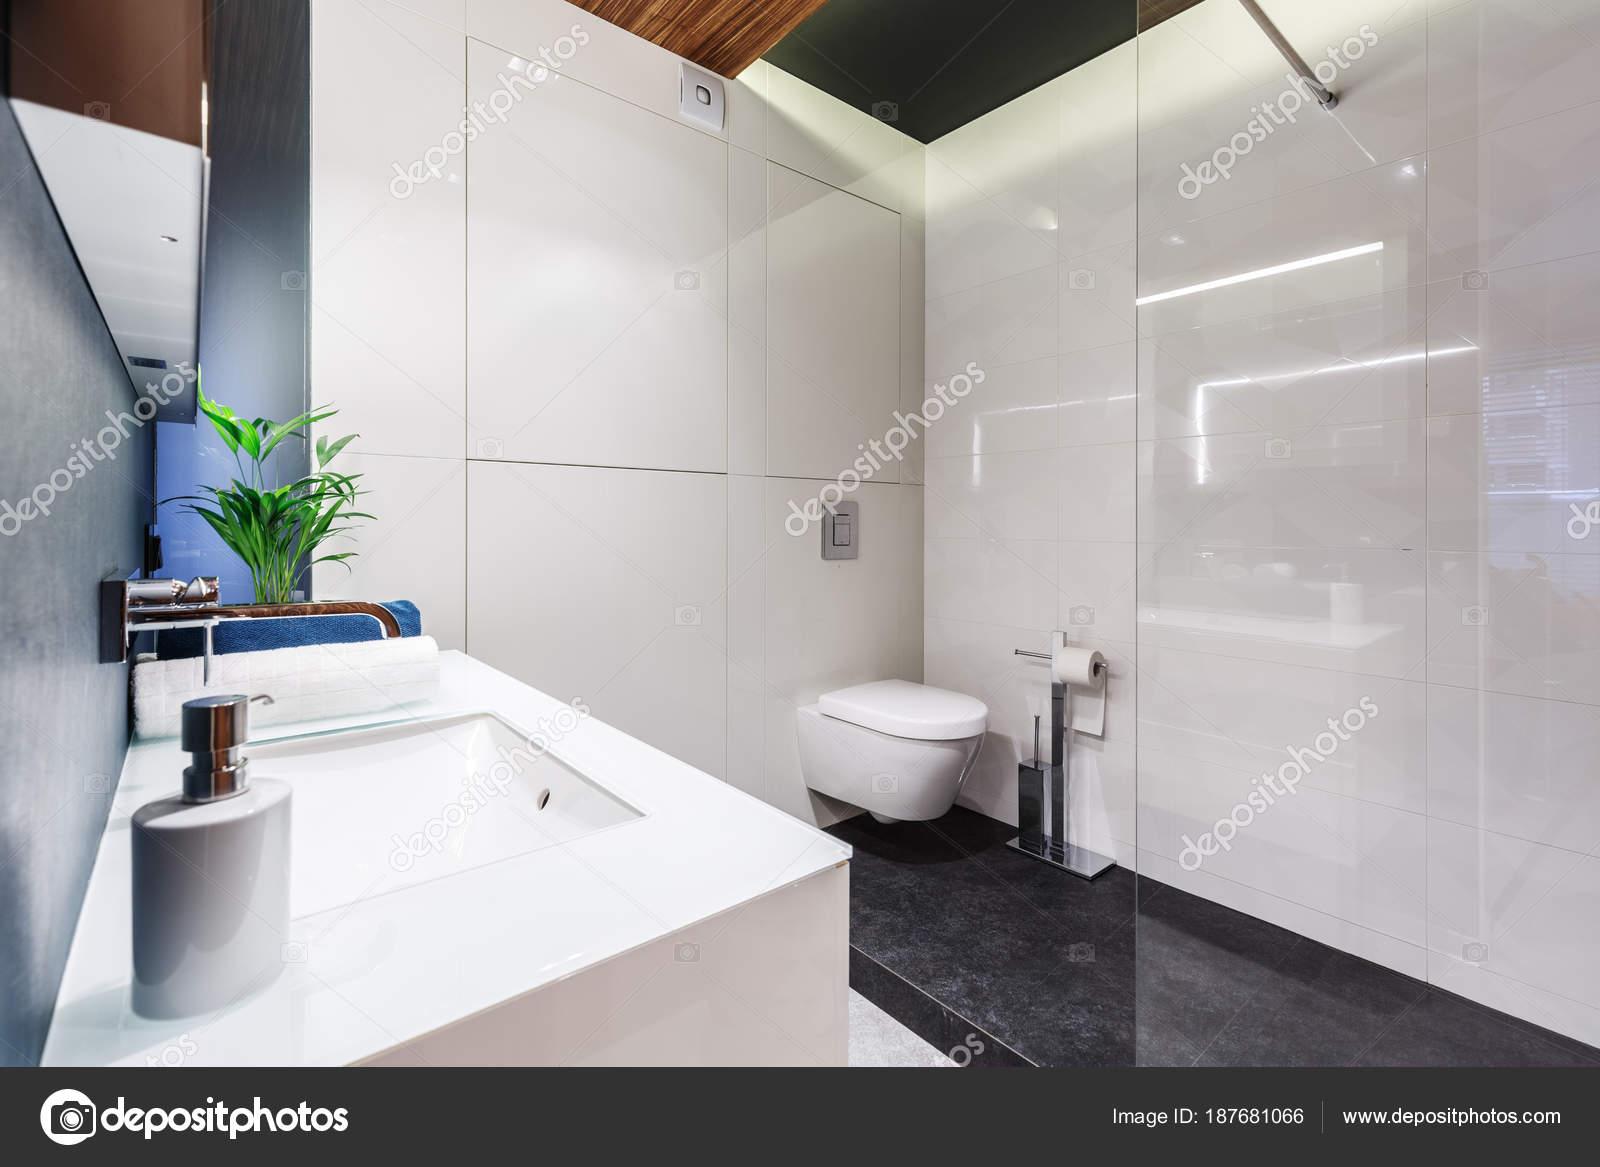 Moderne Witte Badkamer : Moderne witte badkamer interieur u2014 stockfoto © photographee.eu